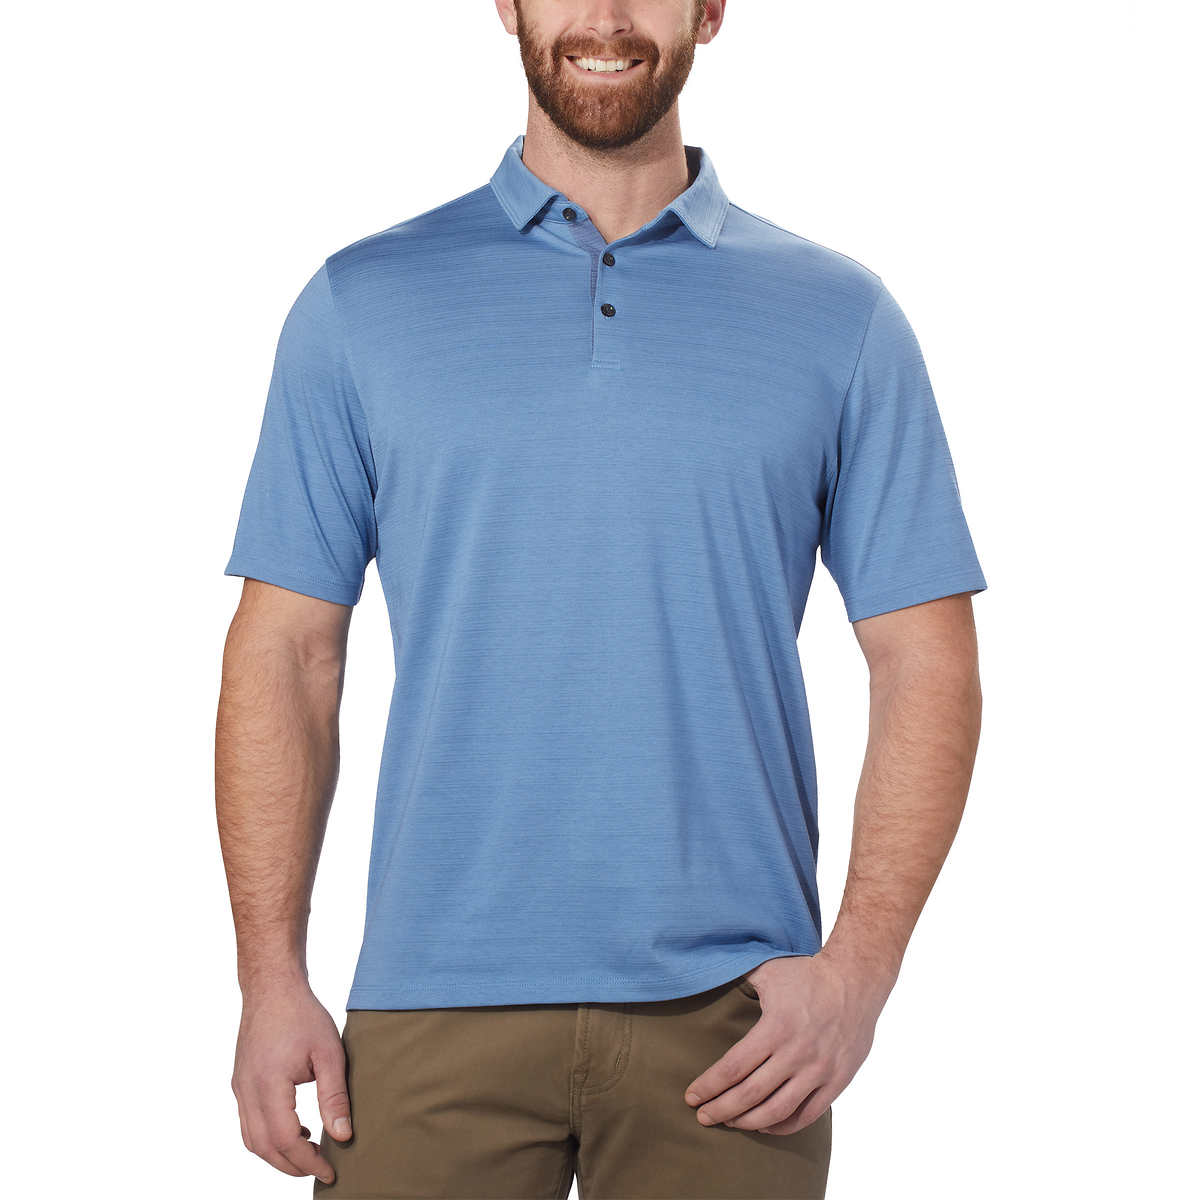 Kirkland Signature Men's Cotton Poly Polo Shirt (Light Blue, XL)